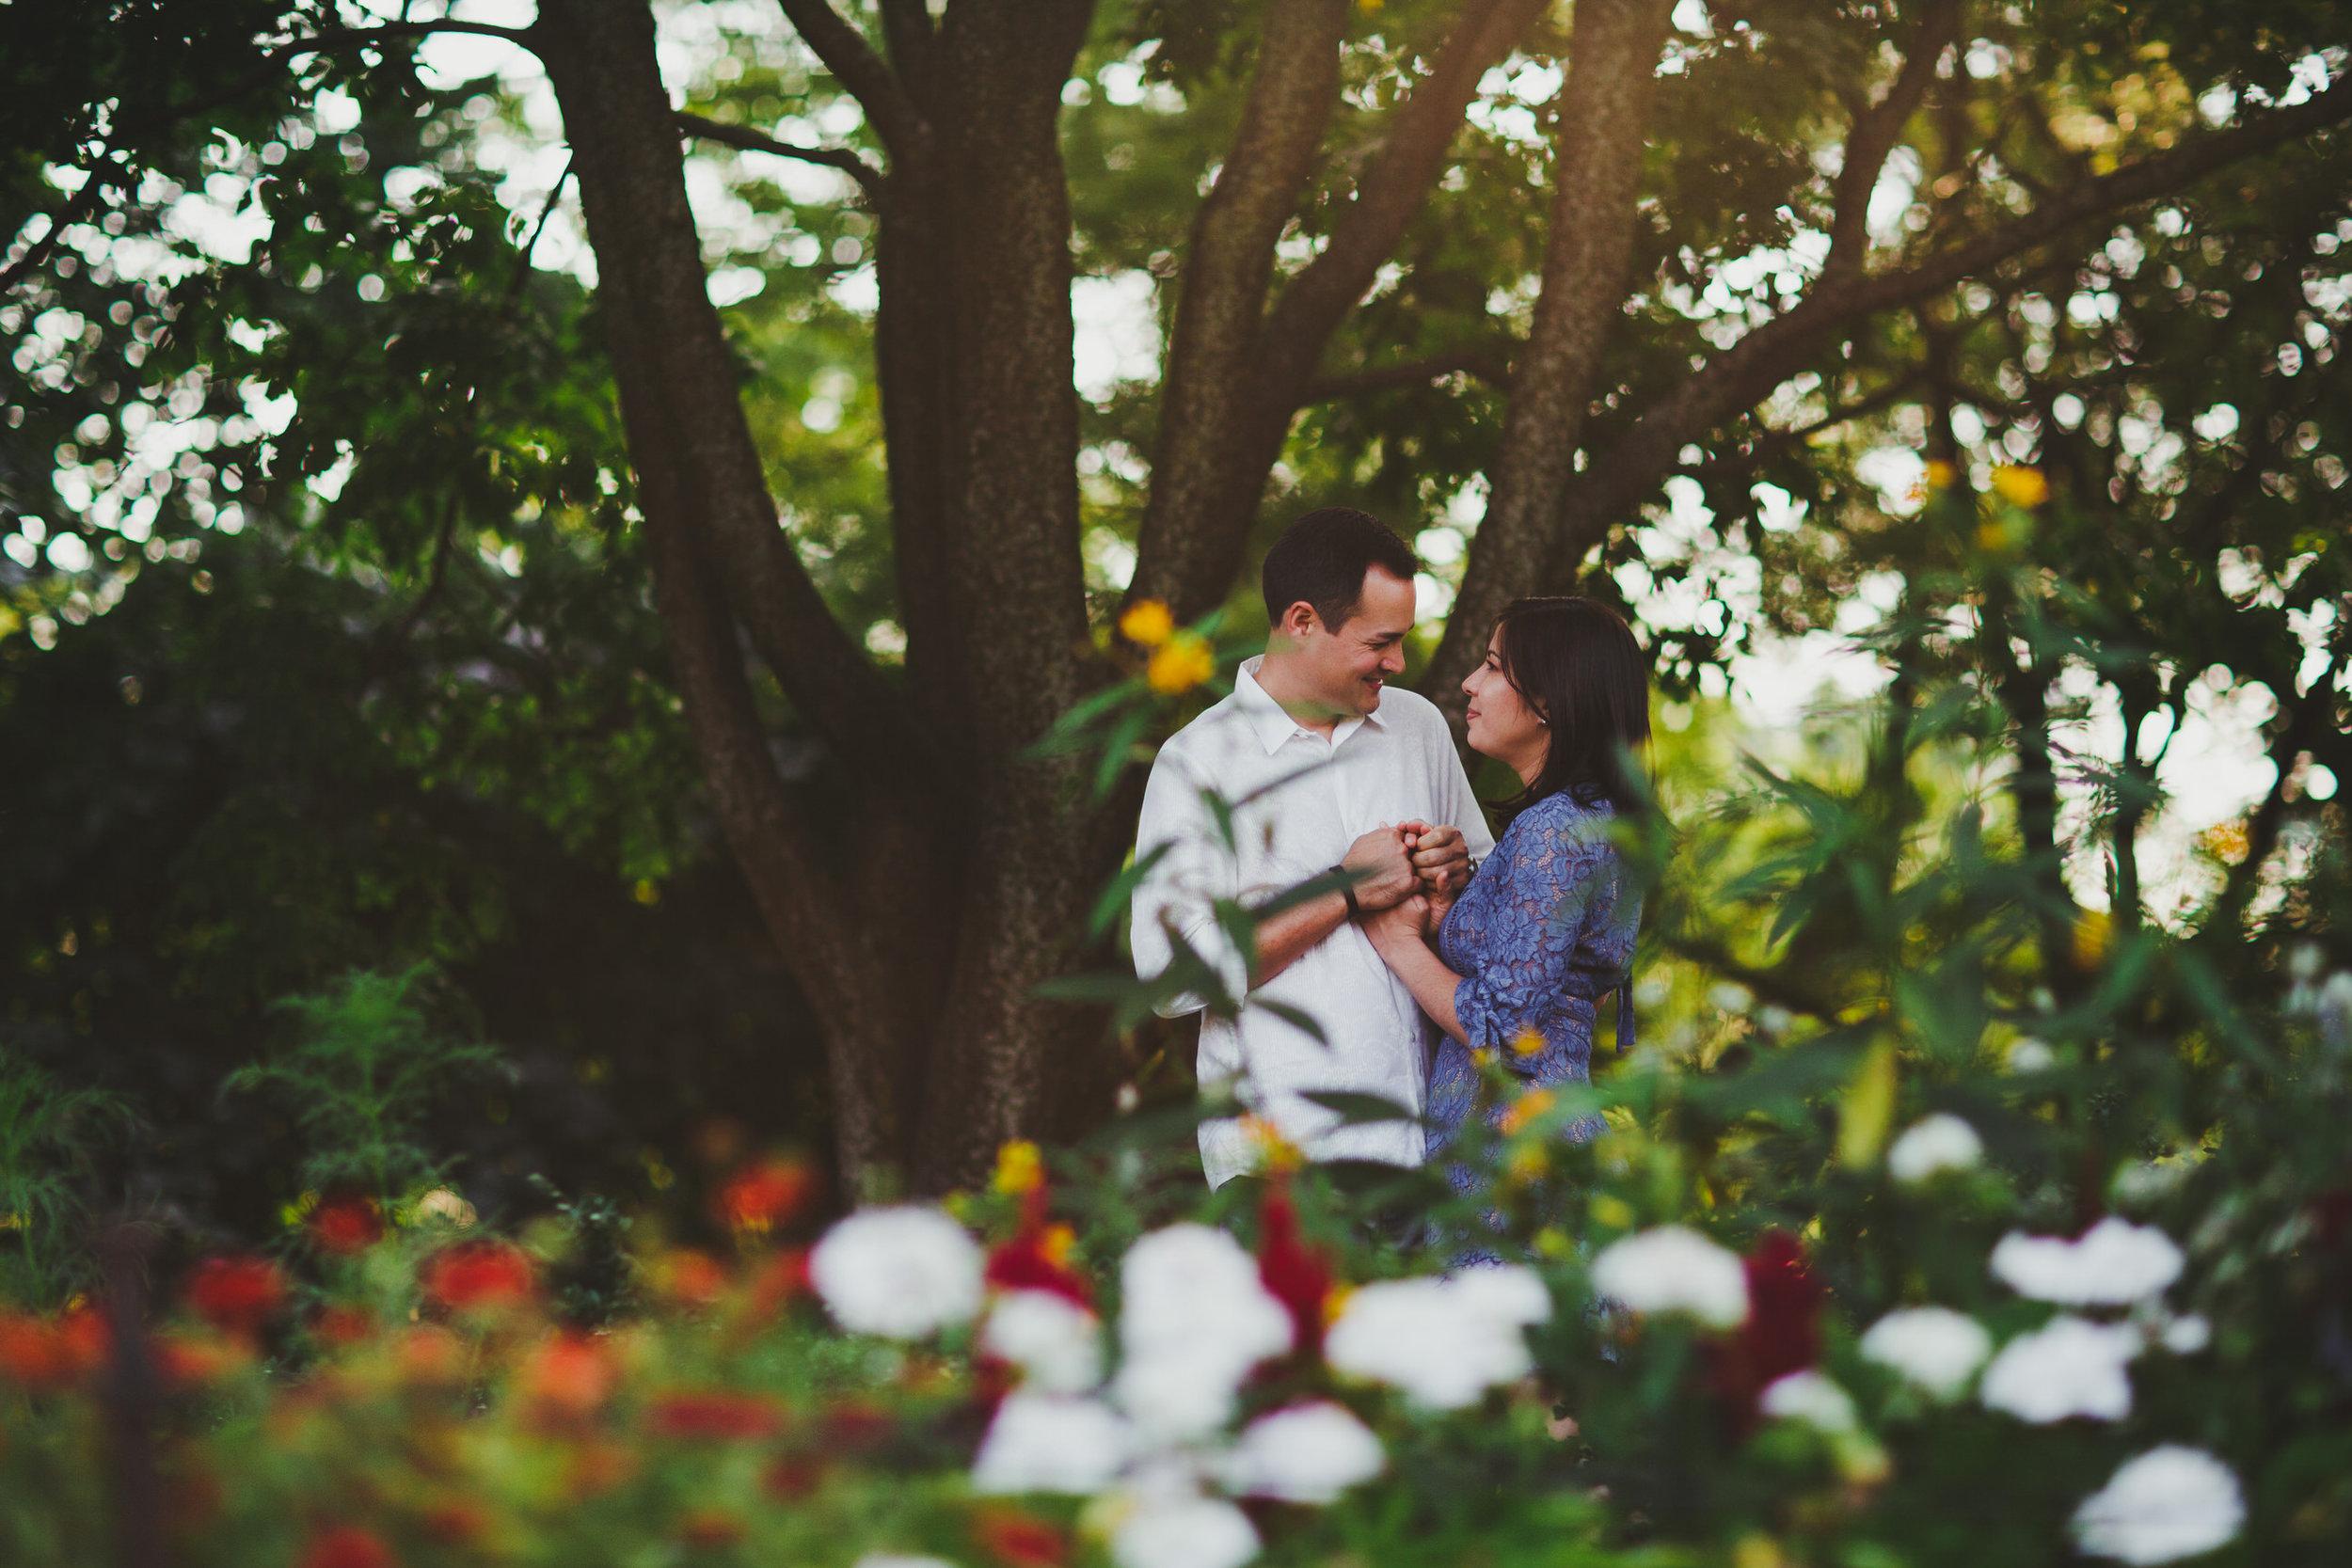 international_wedding_photographer_engagement_portraits_timeless_love_tiny_house_photo.jpg